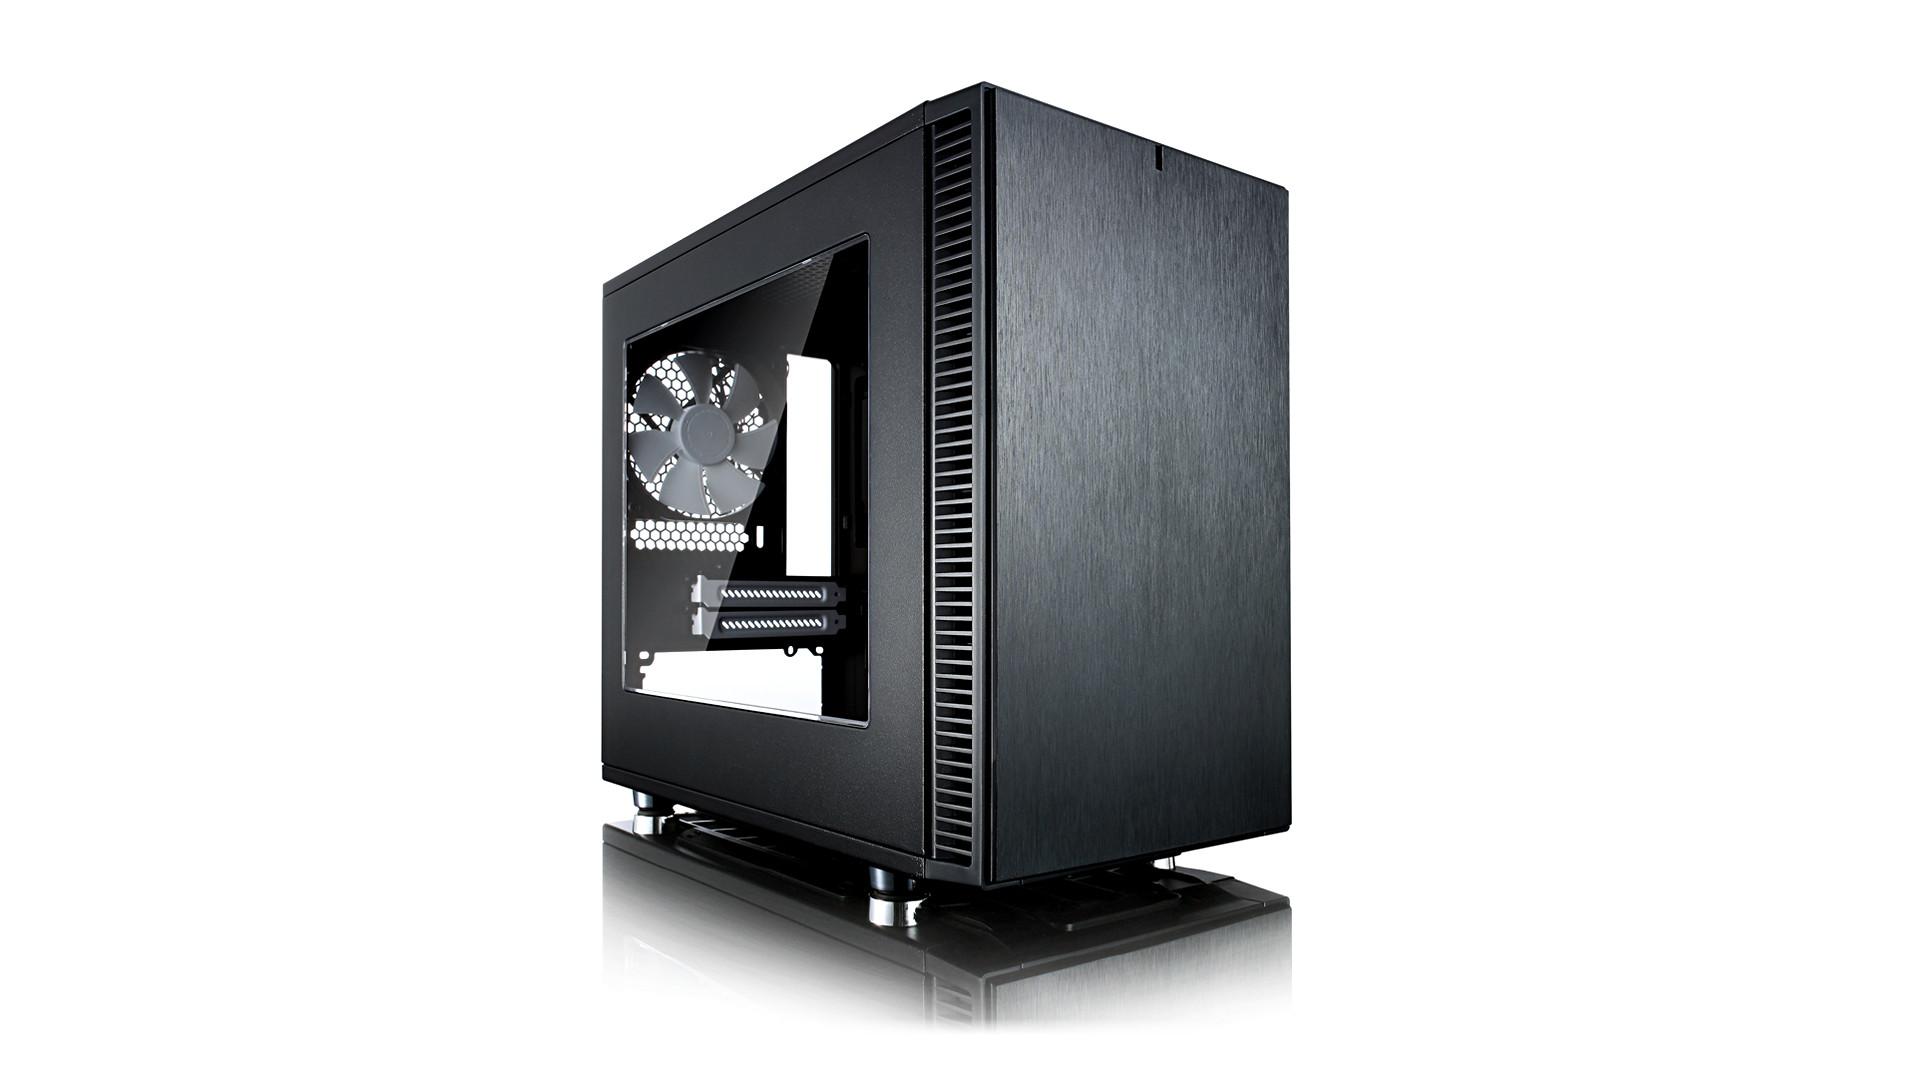 02d5009b7e9 Arvuti 800€ eest - ideaalne 1080p mängurimasin - Level1